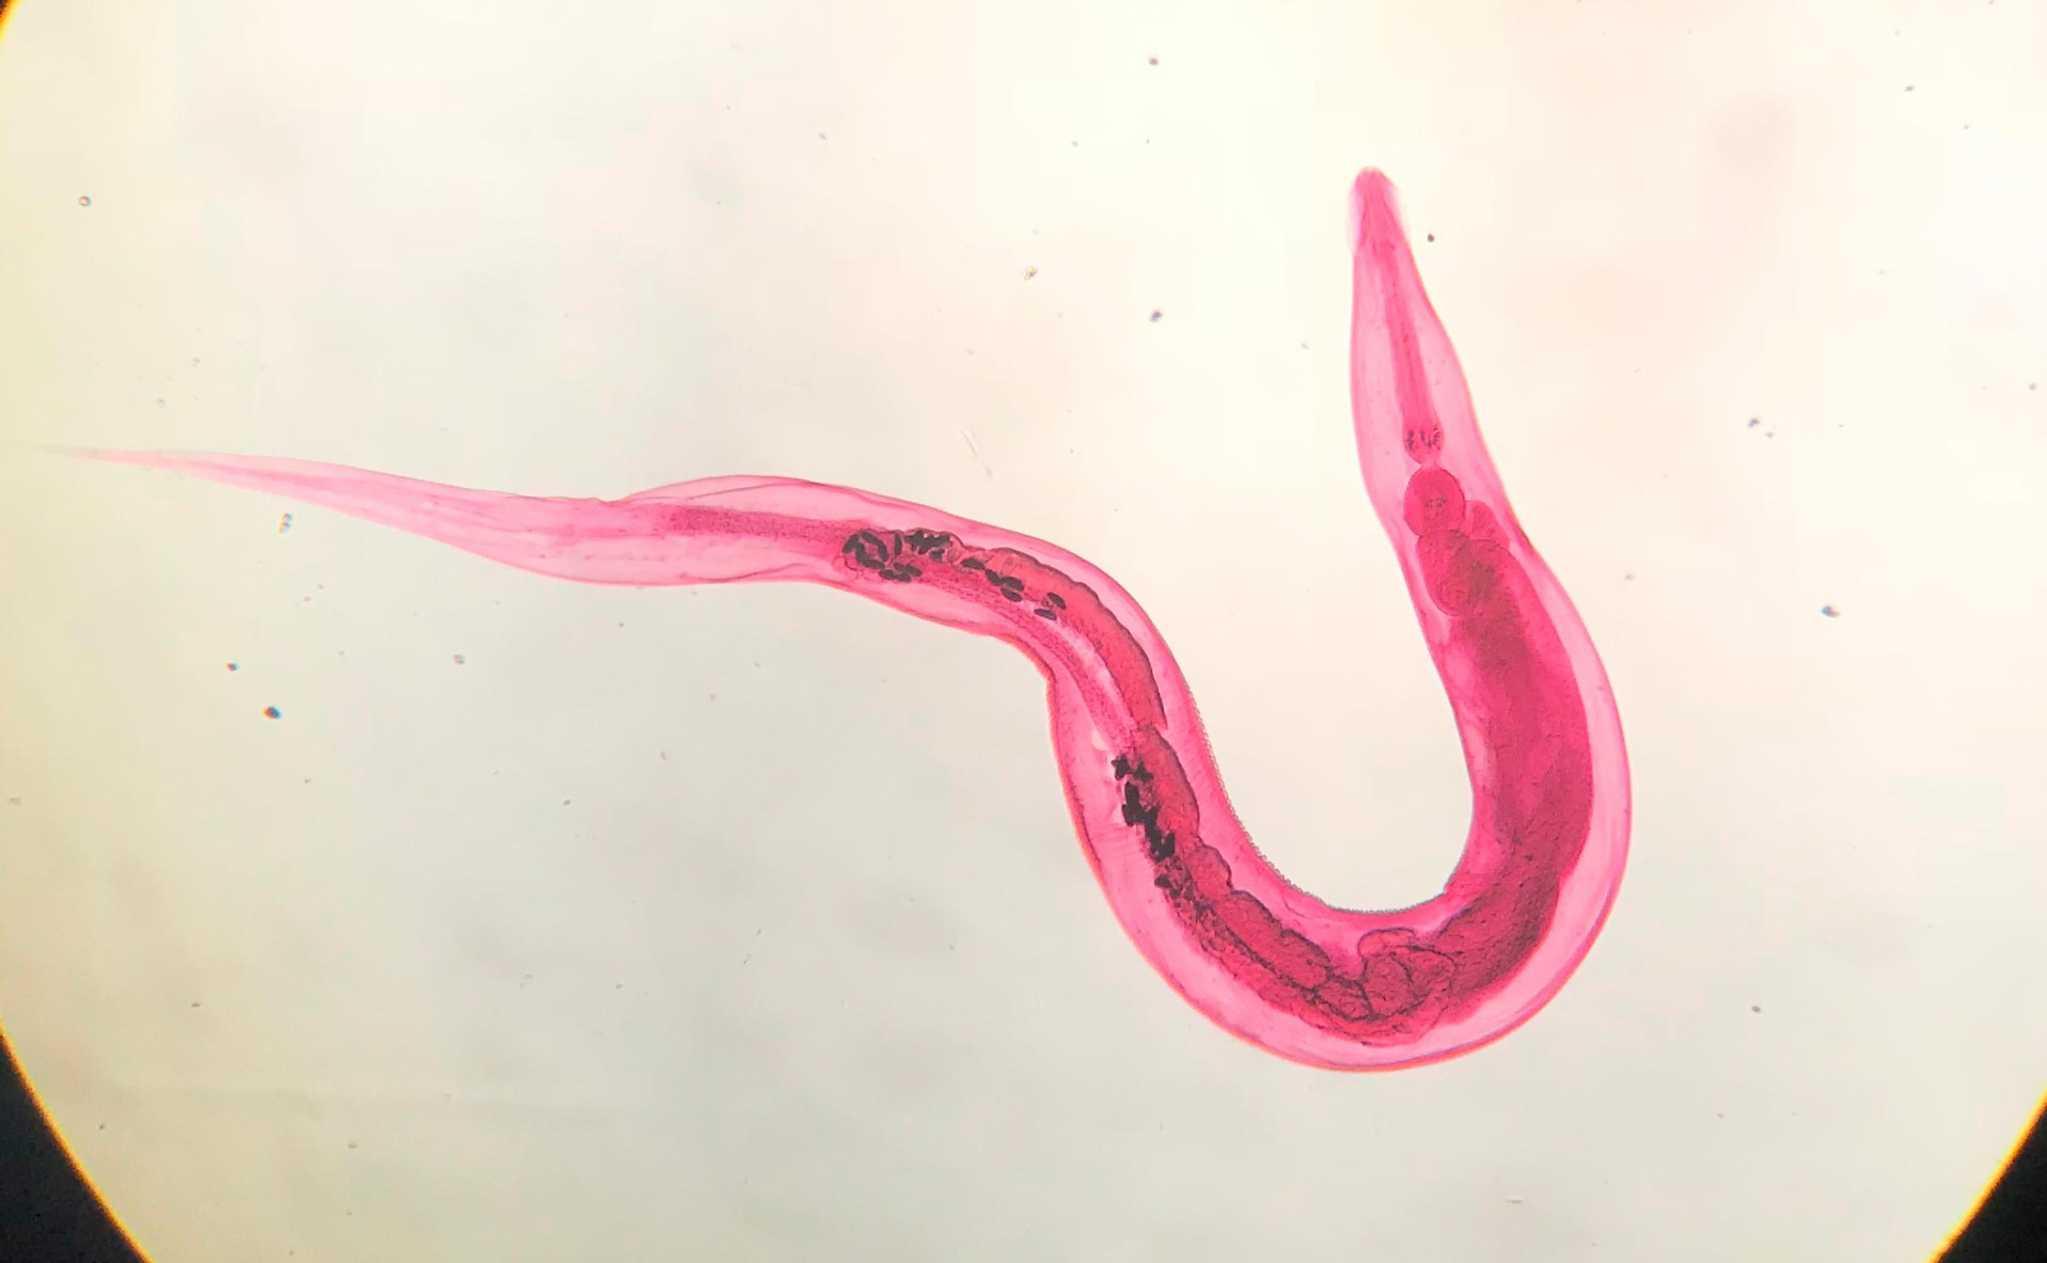 Madenwurmer Ursache Symptome Massnahmen